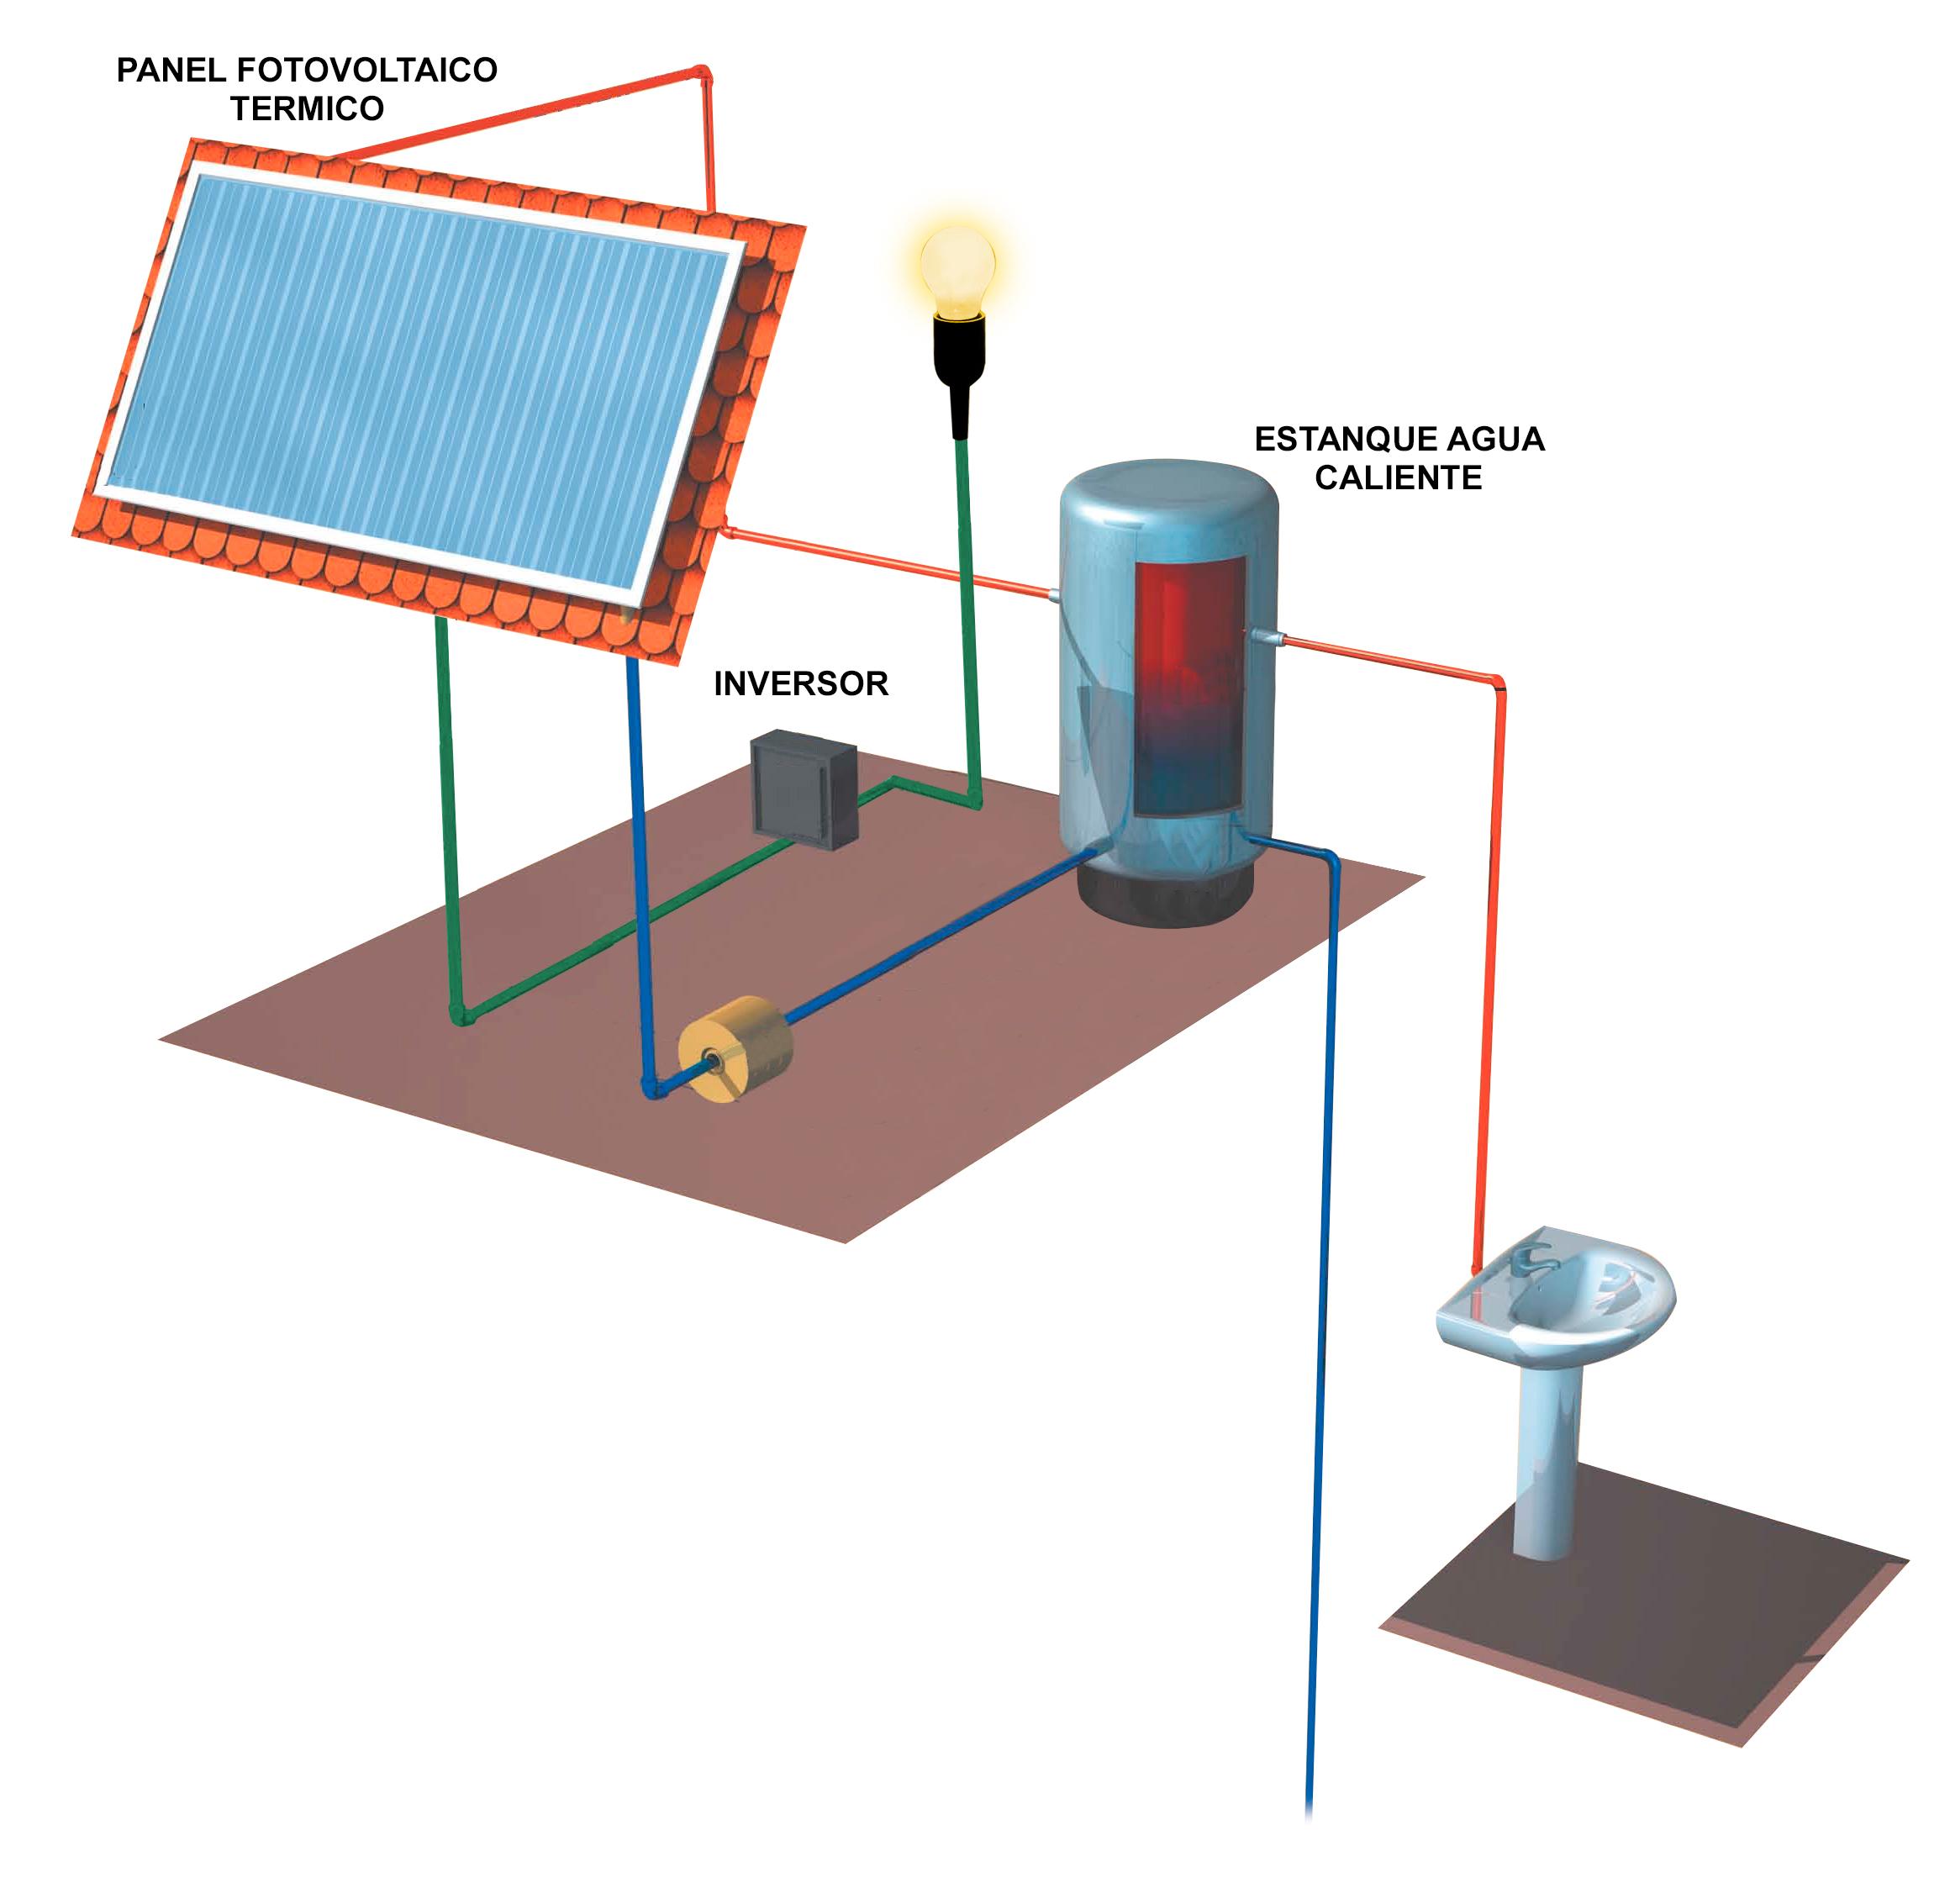 esquema-termoelectrico_ok